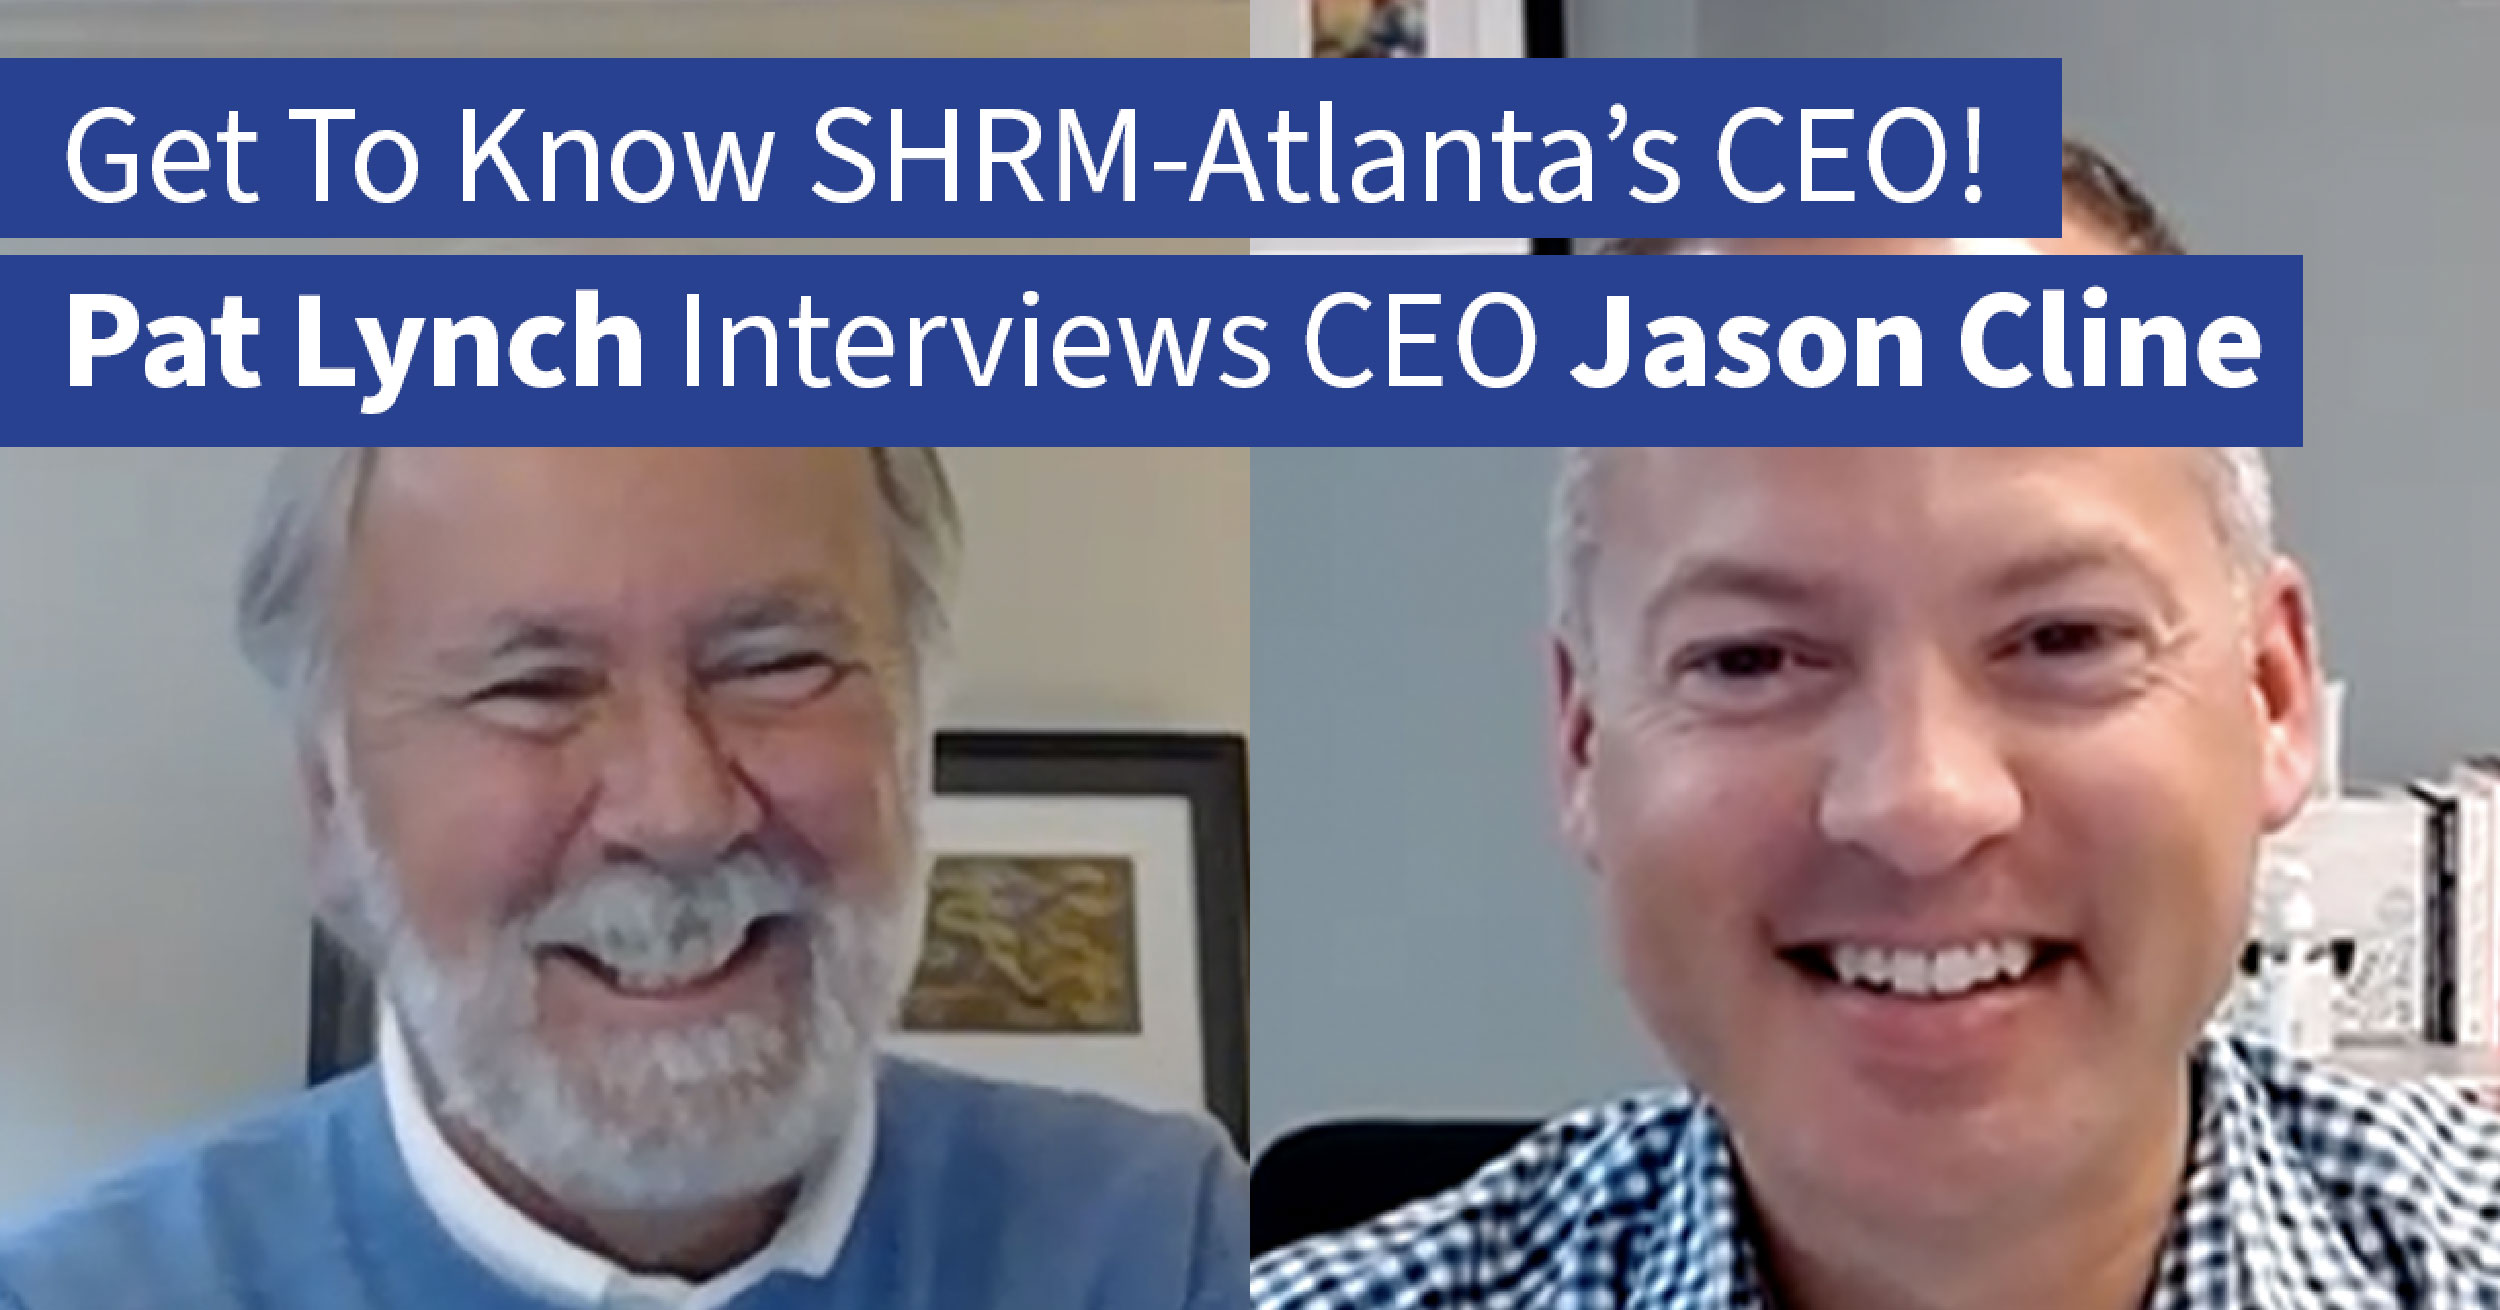 Get To Know SHRM-Atlanta's CEO! Pat Lynch interviews CEO Jason Cline